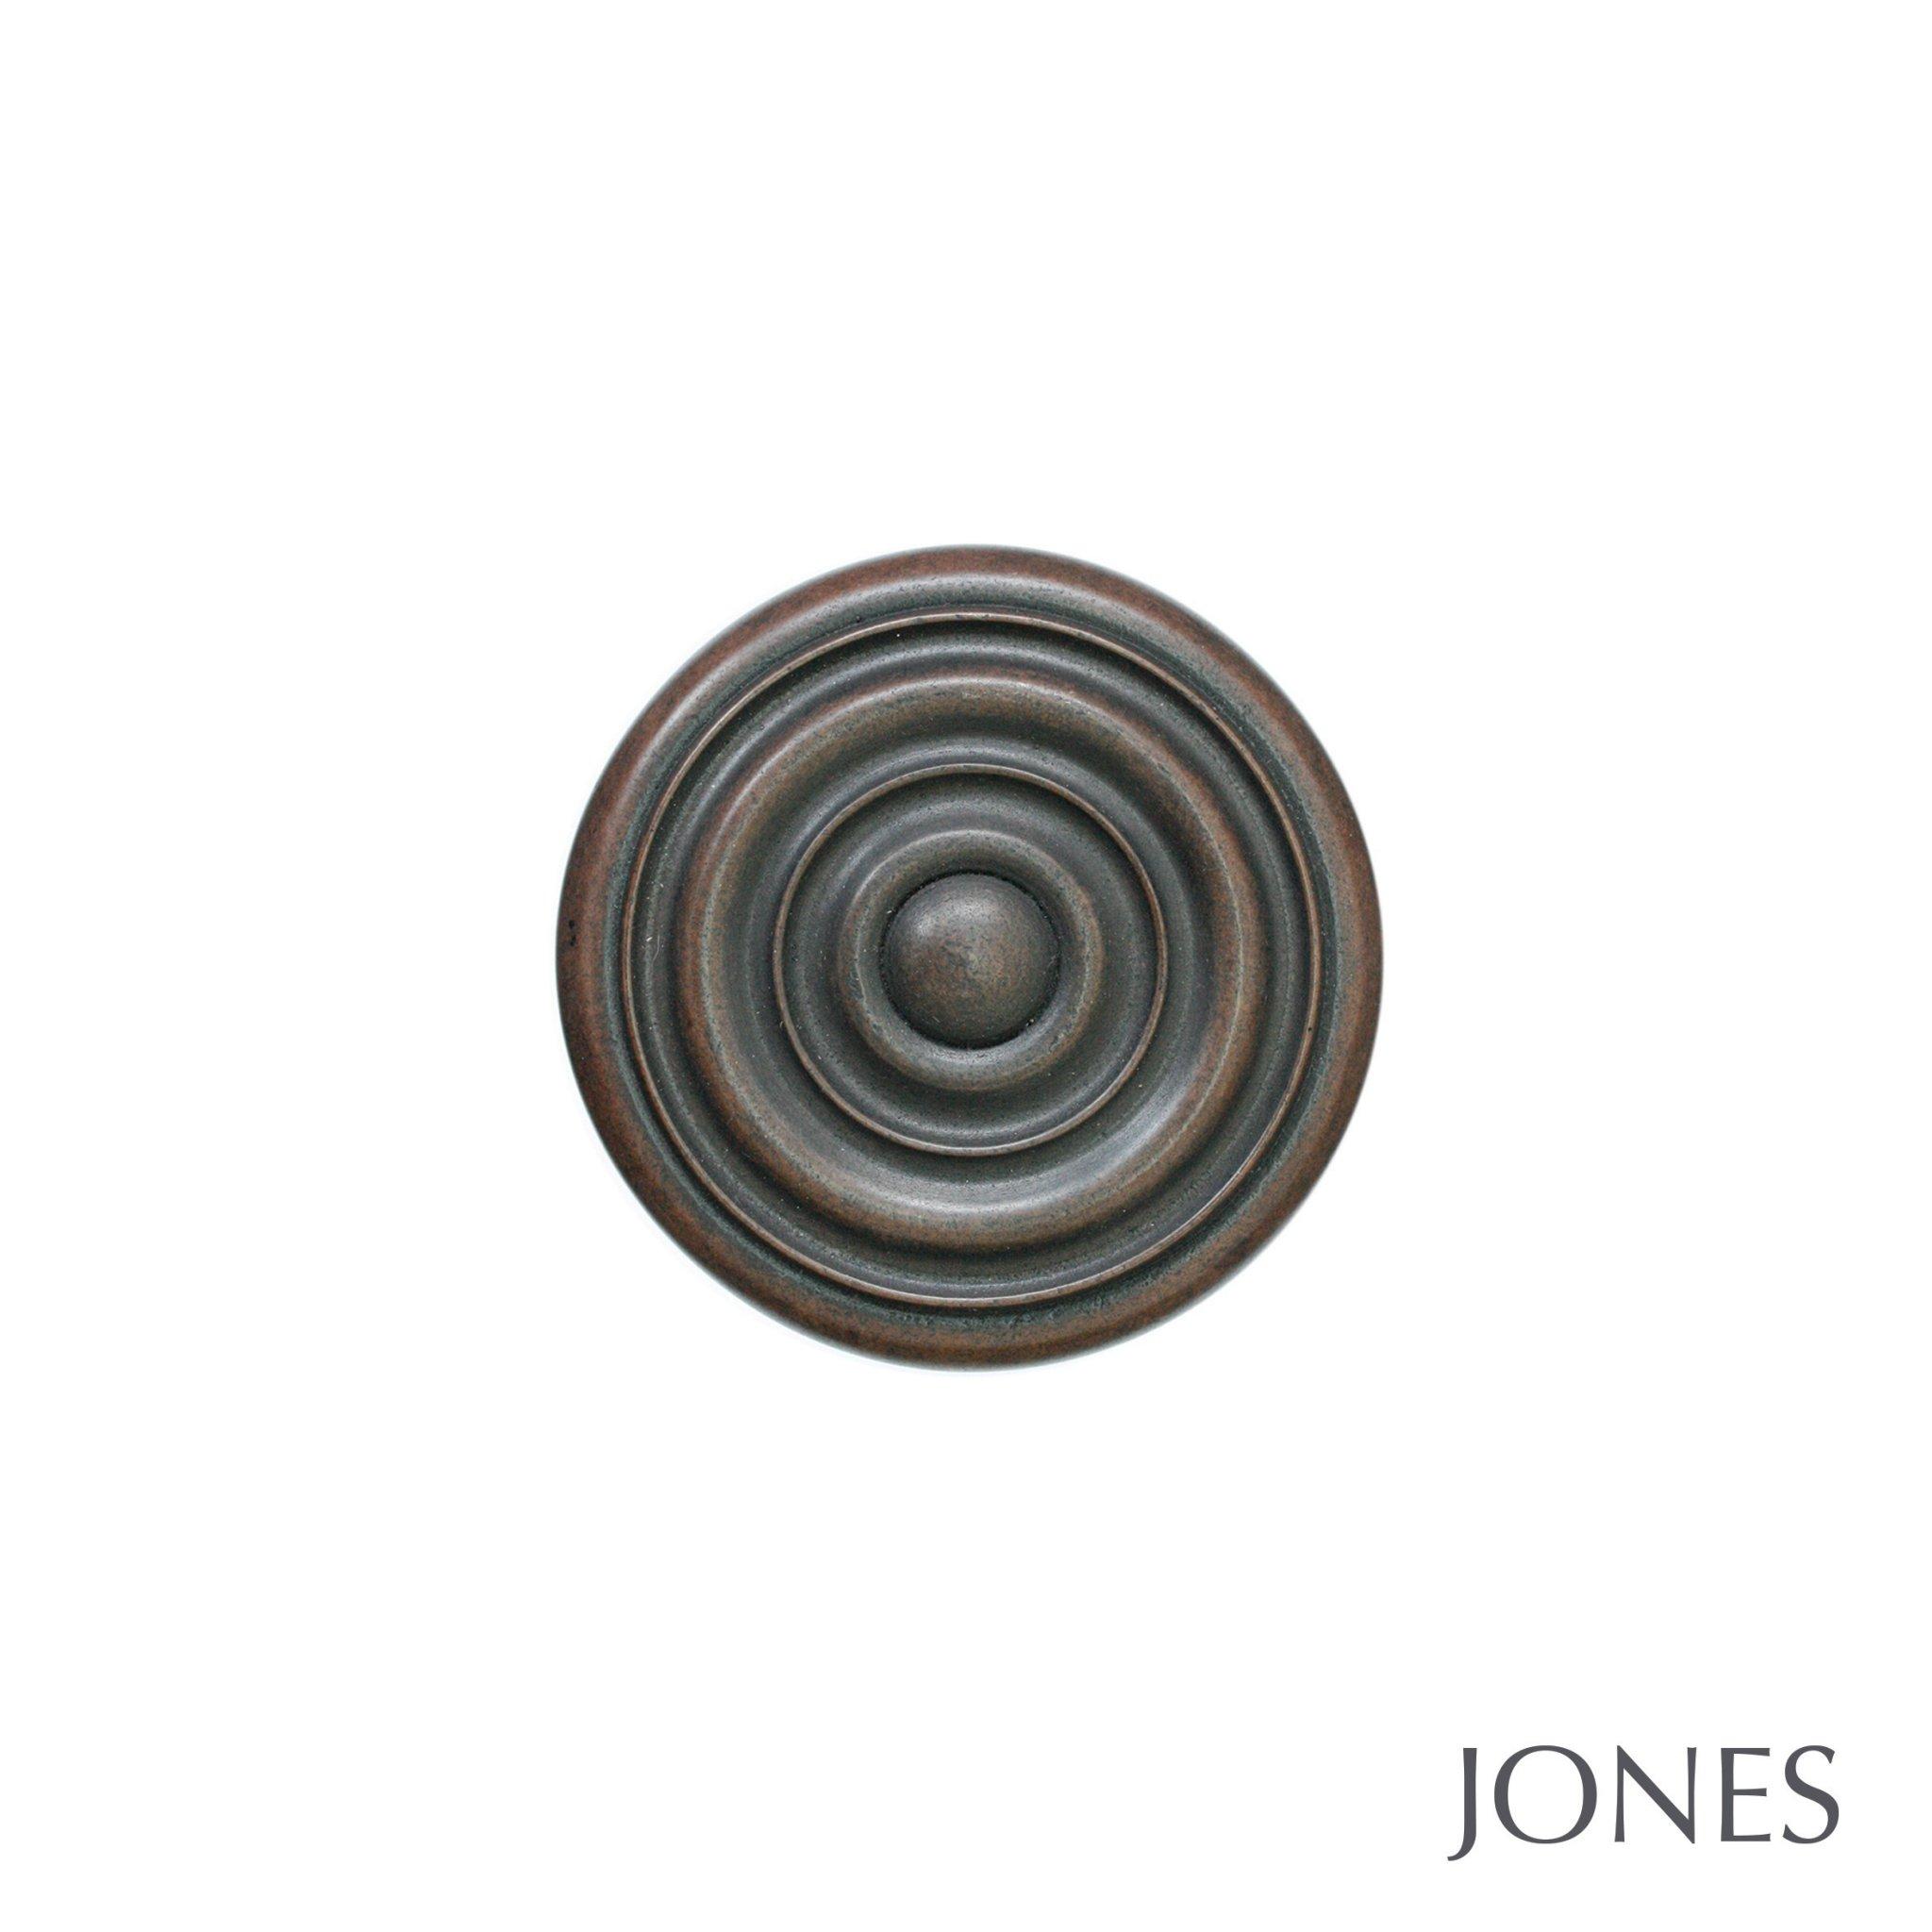 Jones Hardwick Handcrafted 40mm Holdbacks